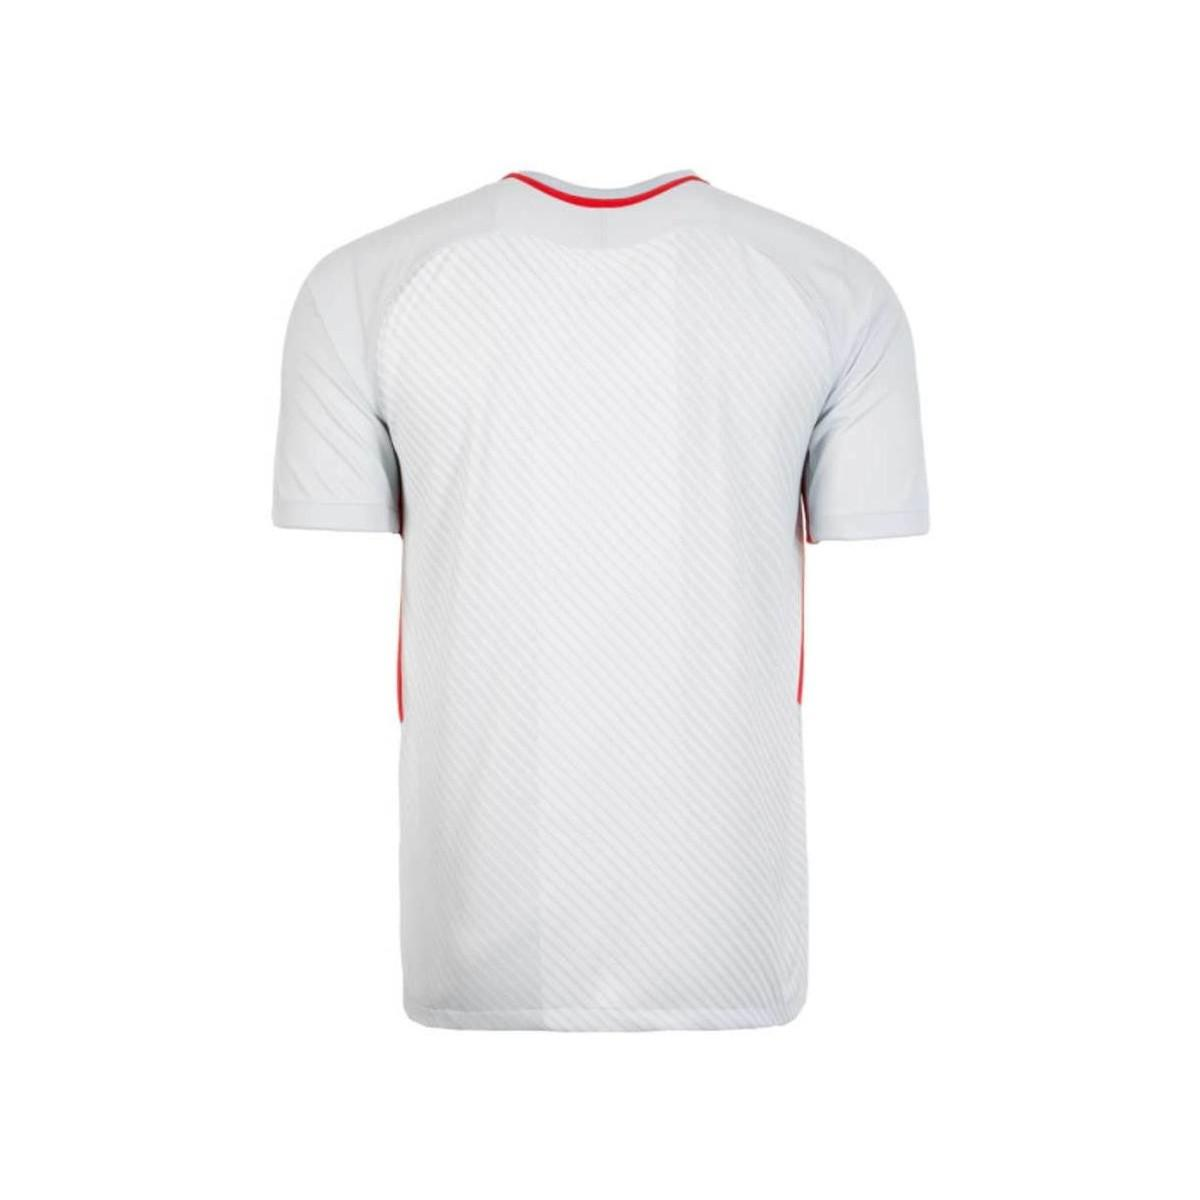 bd1cd8472b813 Nike 2017-2018 Spartak Moscow Away Football Shirt Men's T Shirt In ...